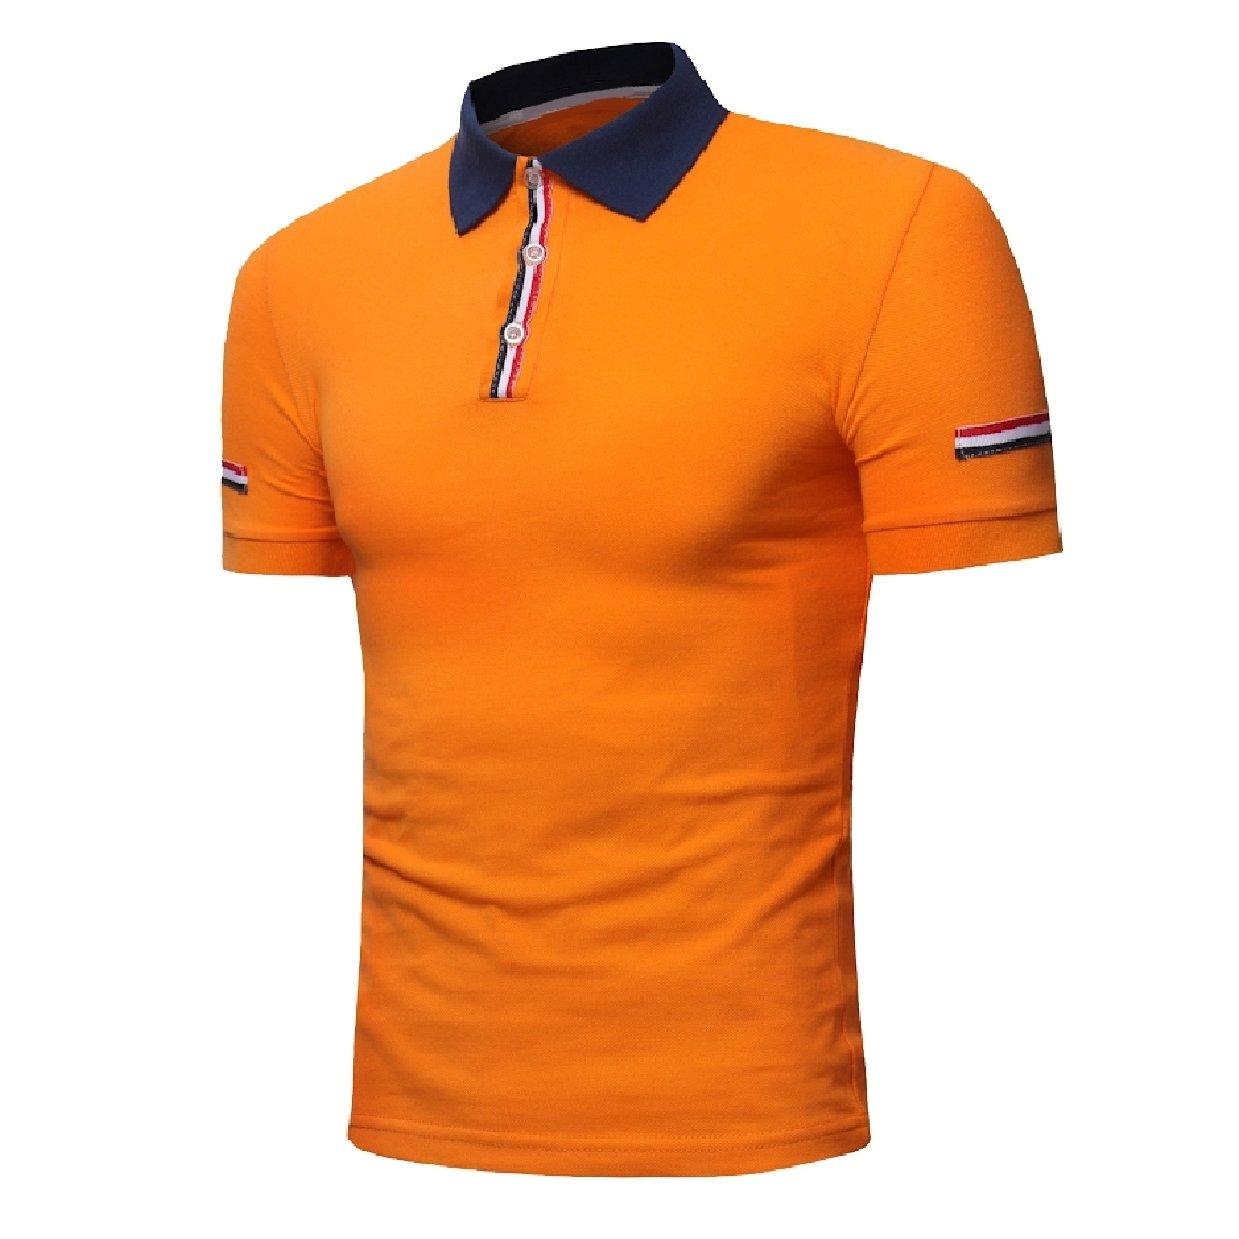 Howme Mens Tees Short Sleeve Juniors Stitch Basic Cotton Polo Shirts